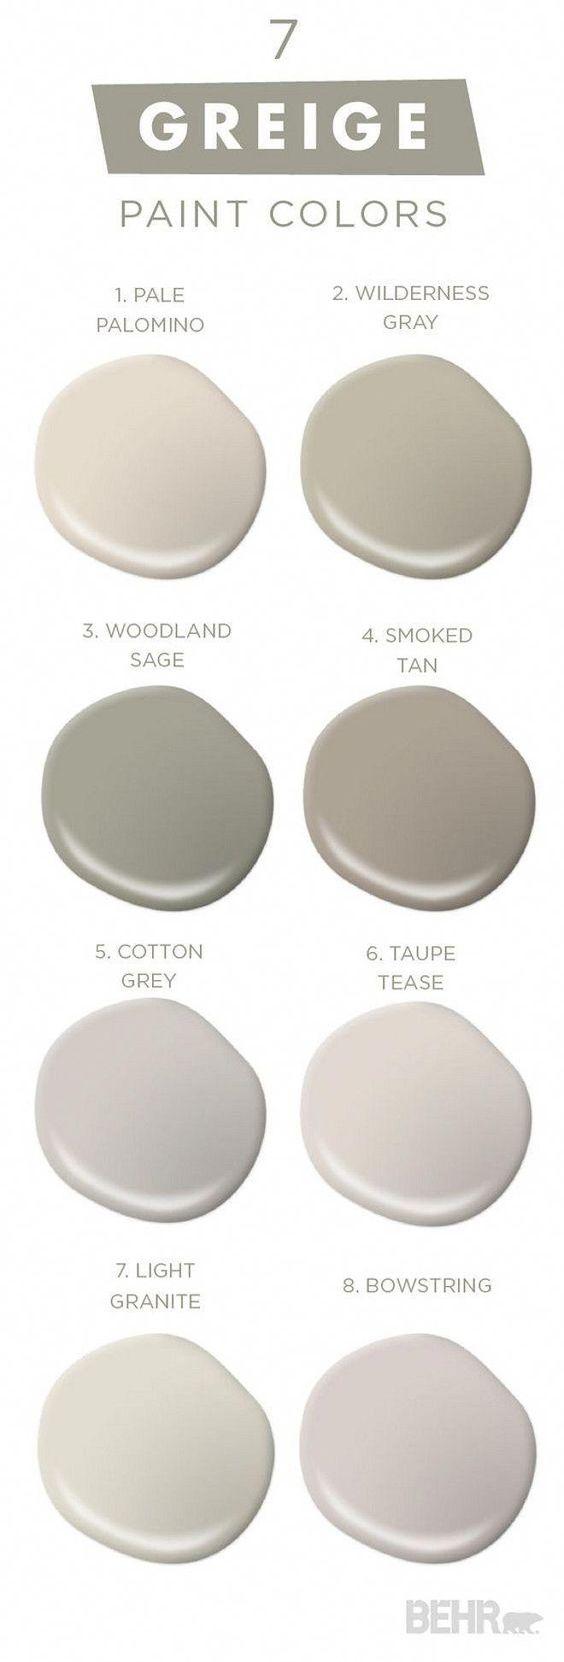 7 Greige Paint Colors. Greige Best Seller Paint Colors by Behr. Behr Pale Palomino. Behr Wilderness Gray. Behr Woodland Sage. Behr Smoked Tan. Behr Cotton Grey. Behr Taupe Tease. Behr Light Granite. Behr Bowstring #BehrPalePalomino #BehrWildernessGray #Be #bedroompaintcolors